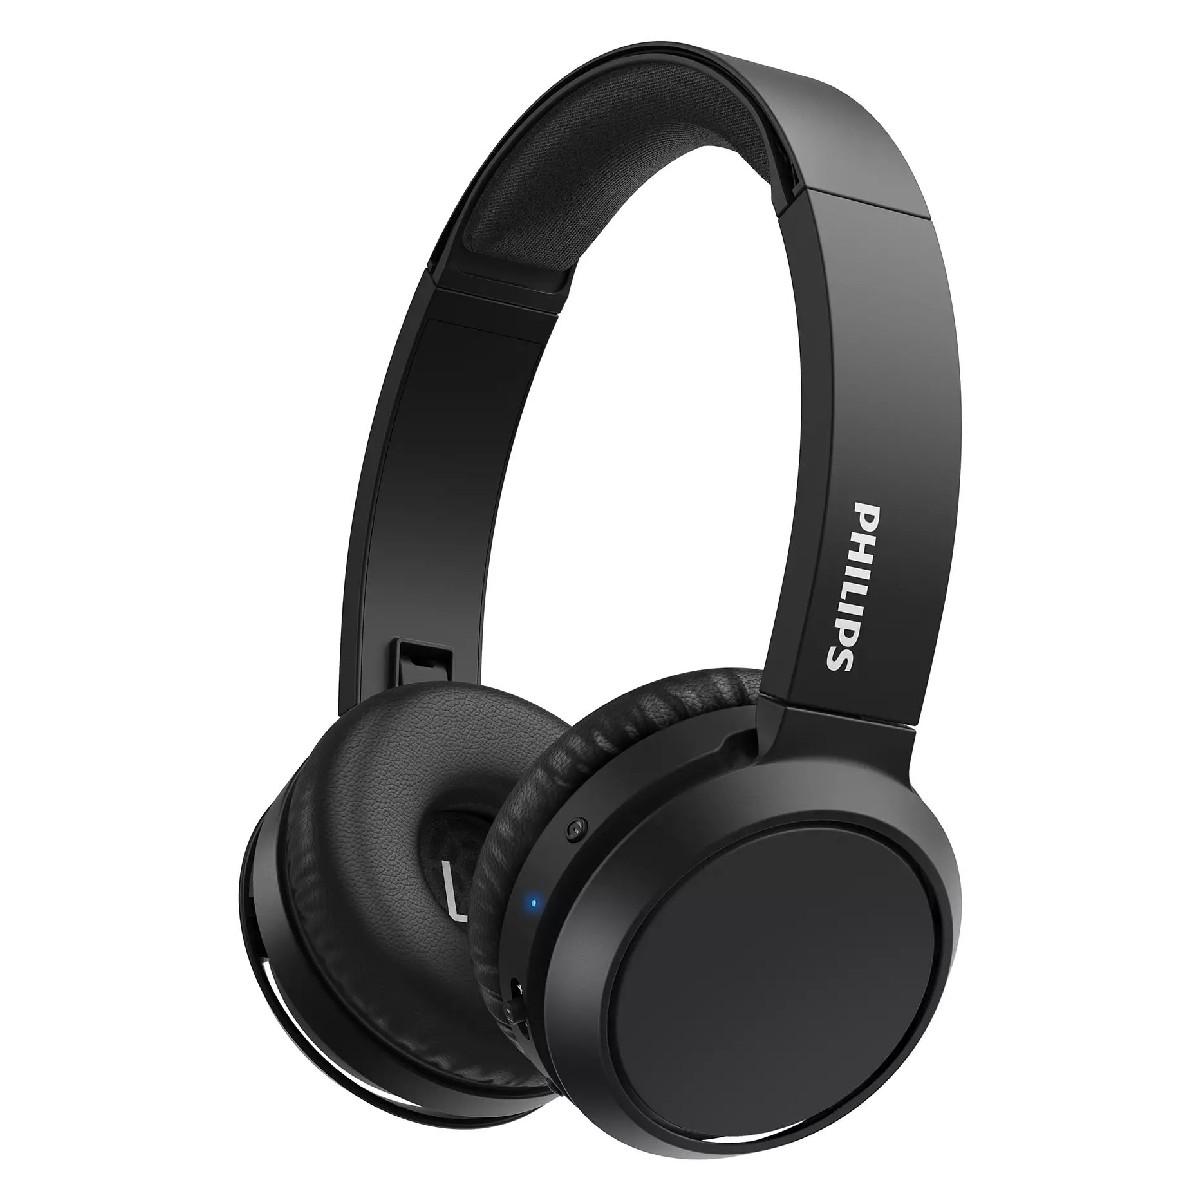 Bluetooth Ακουστικά Stereo Philips TAH4205BK/00 Μαύρα με Μικρόφωνο για Κινητά Τηλέφωνα και Συσκευές Ήχου